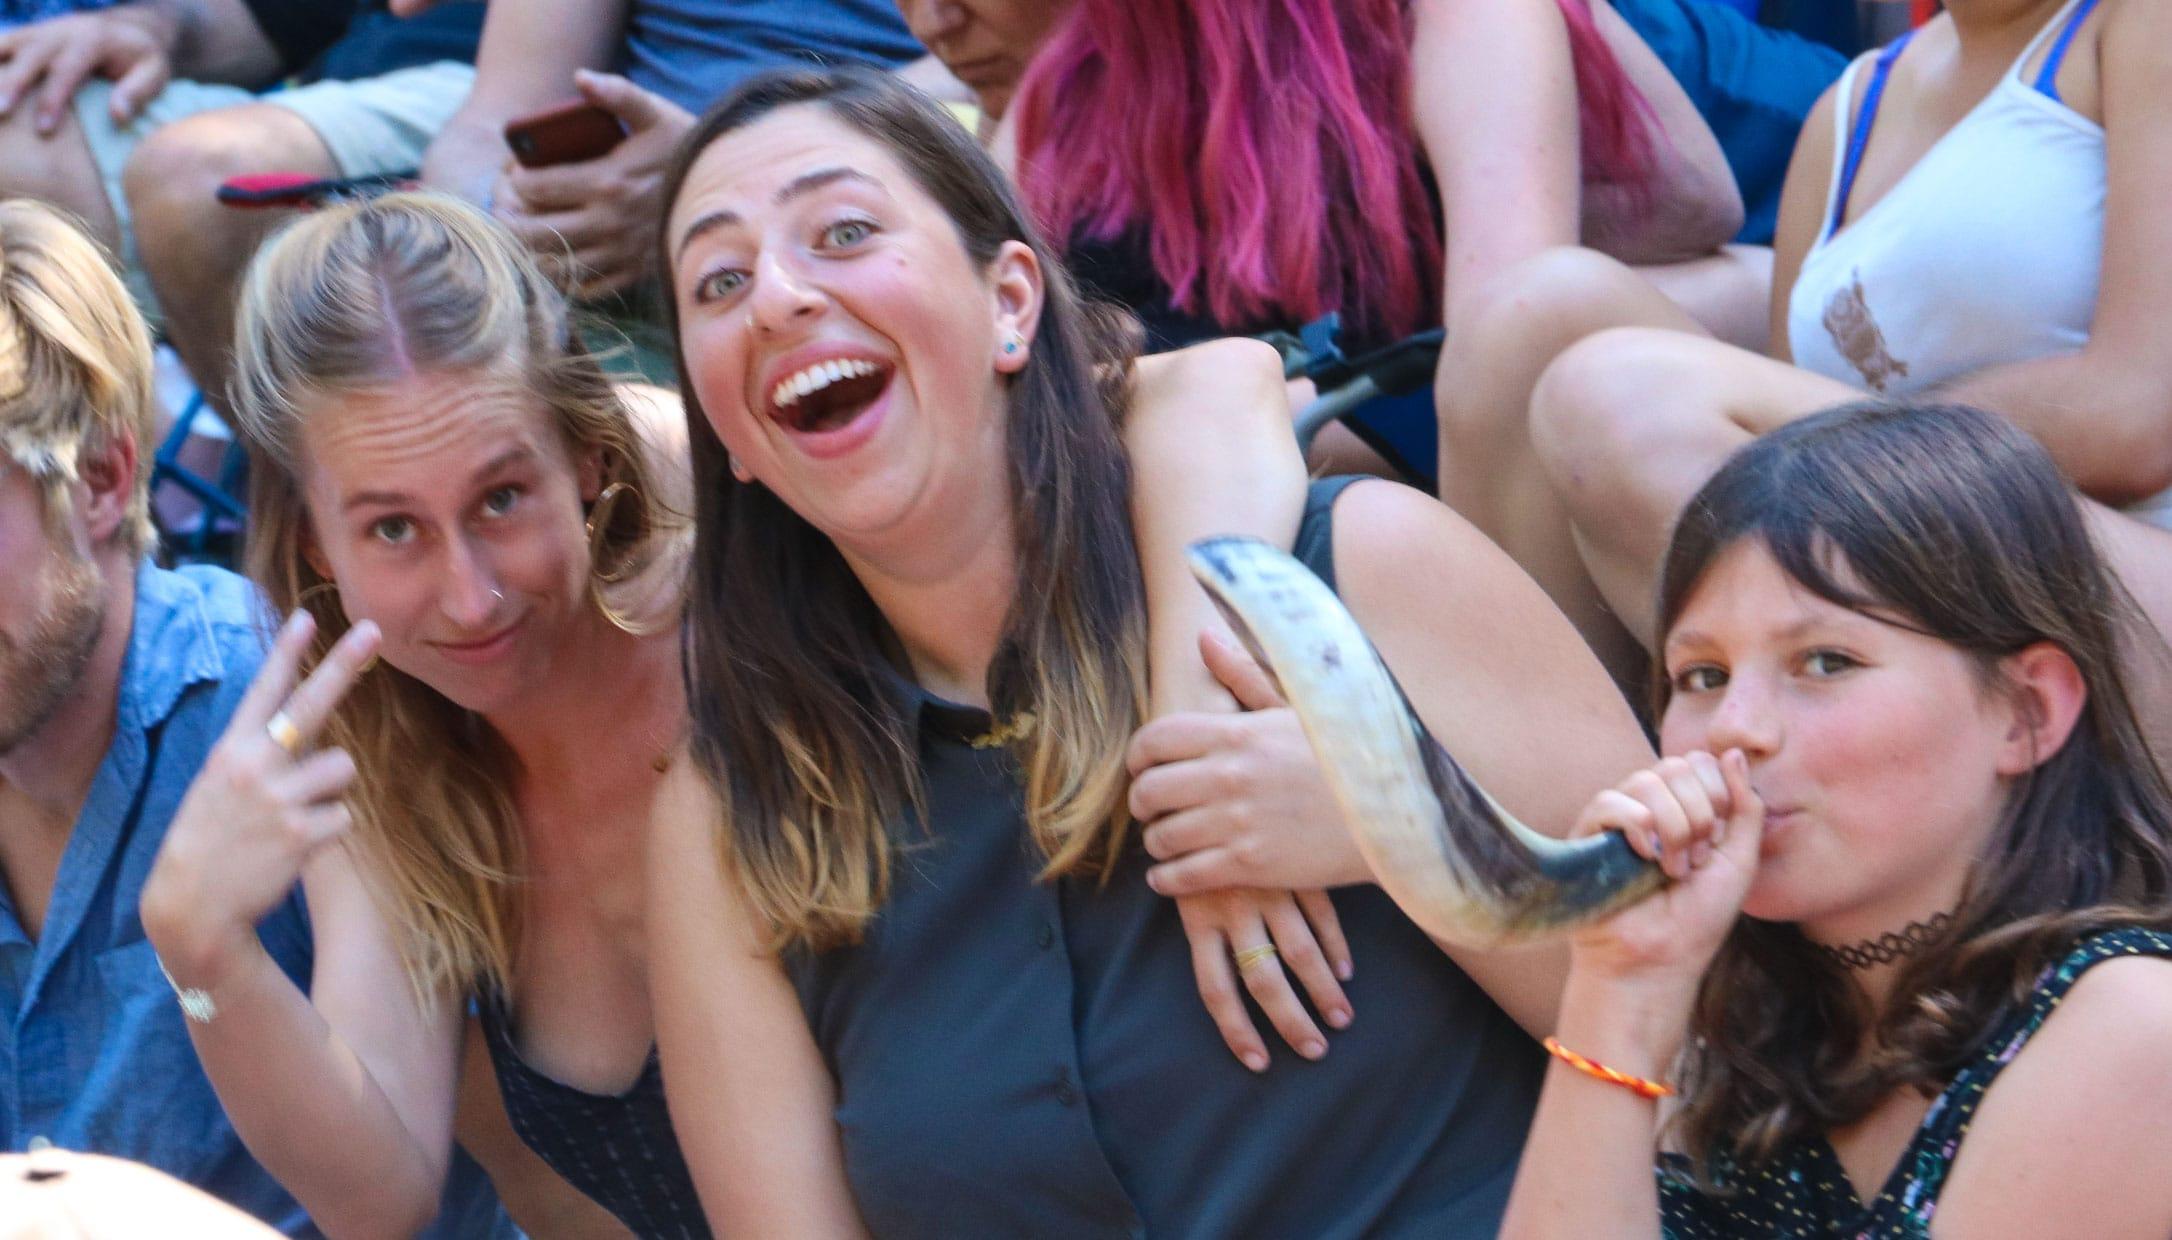 Girls attending a Erev Rosh Hashanah event